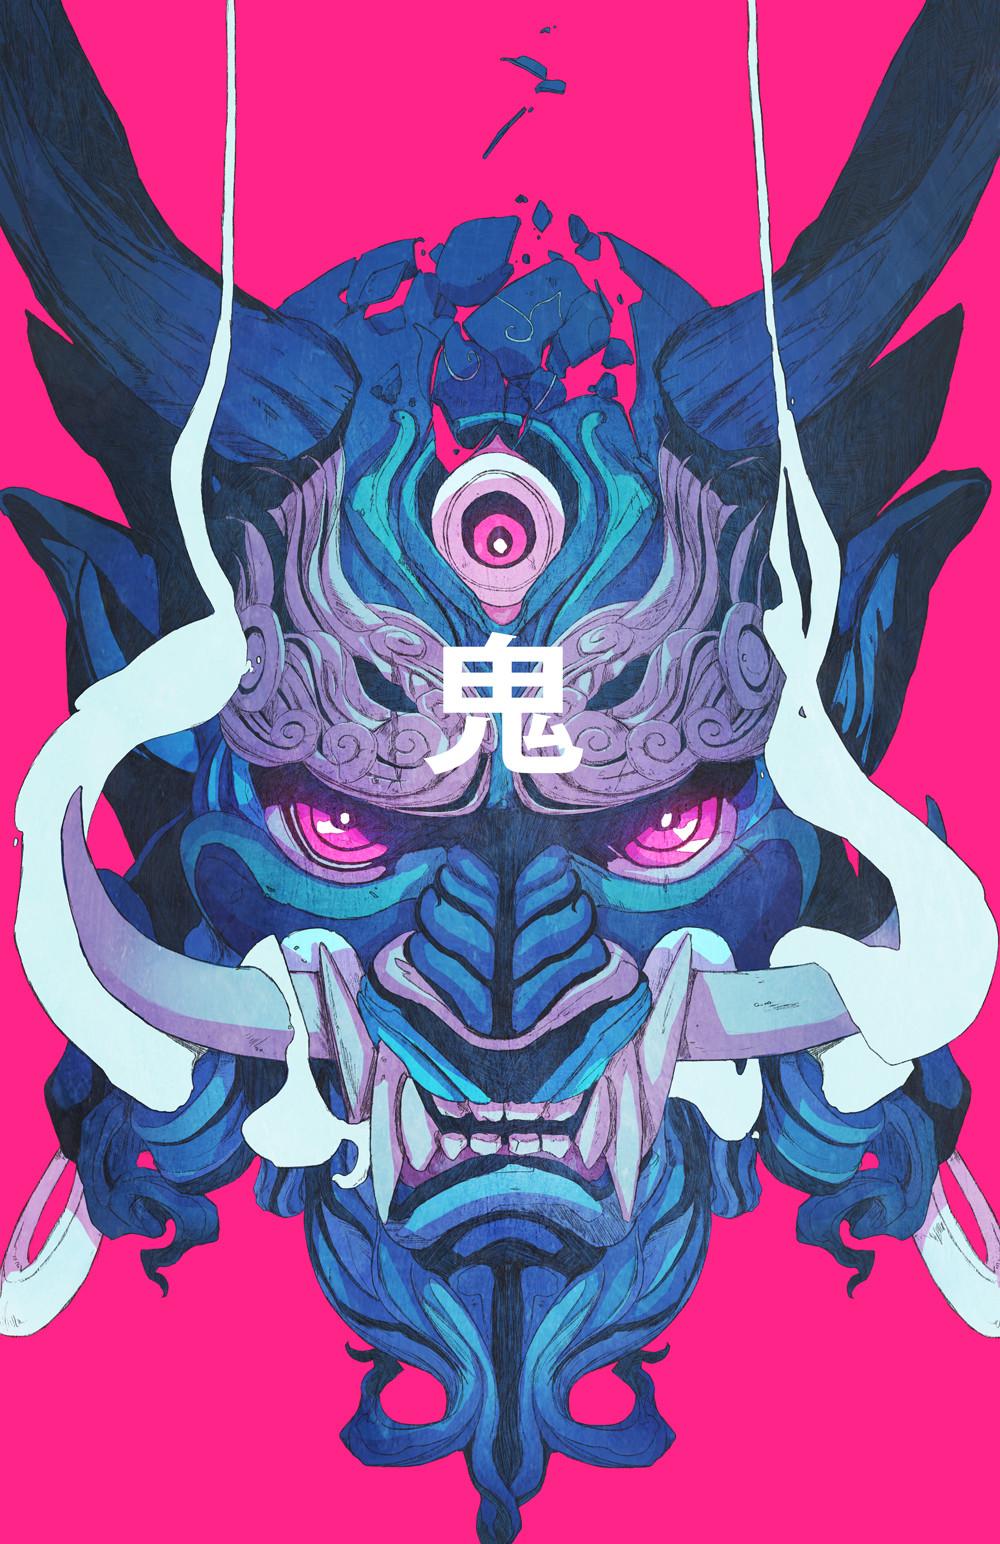 [Reflexion] Les oeuvres qui vous inspirent Chun-lo-mask-lq2